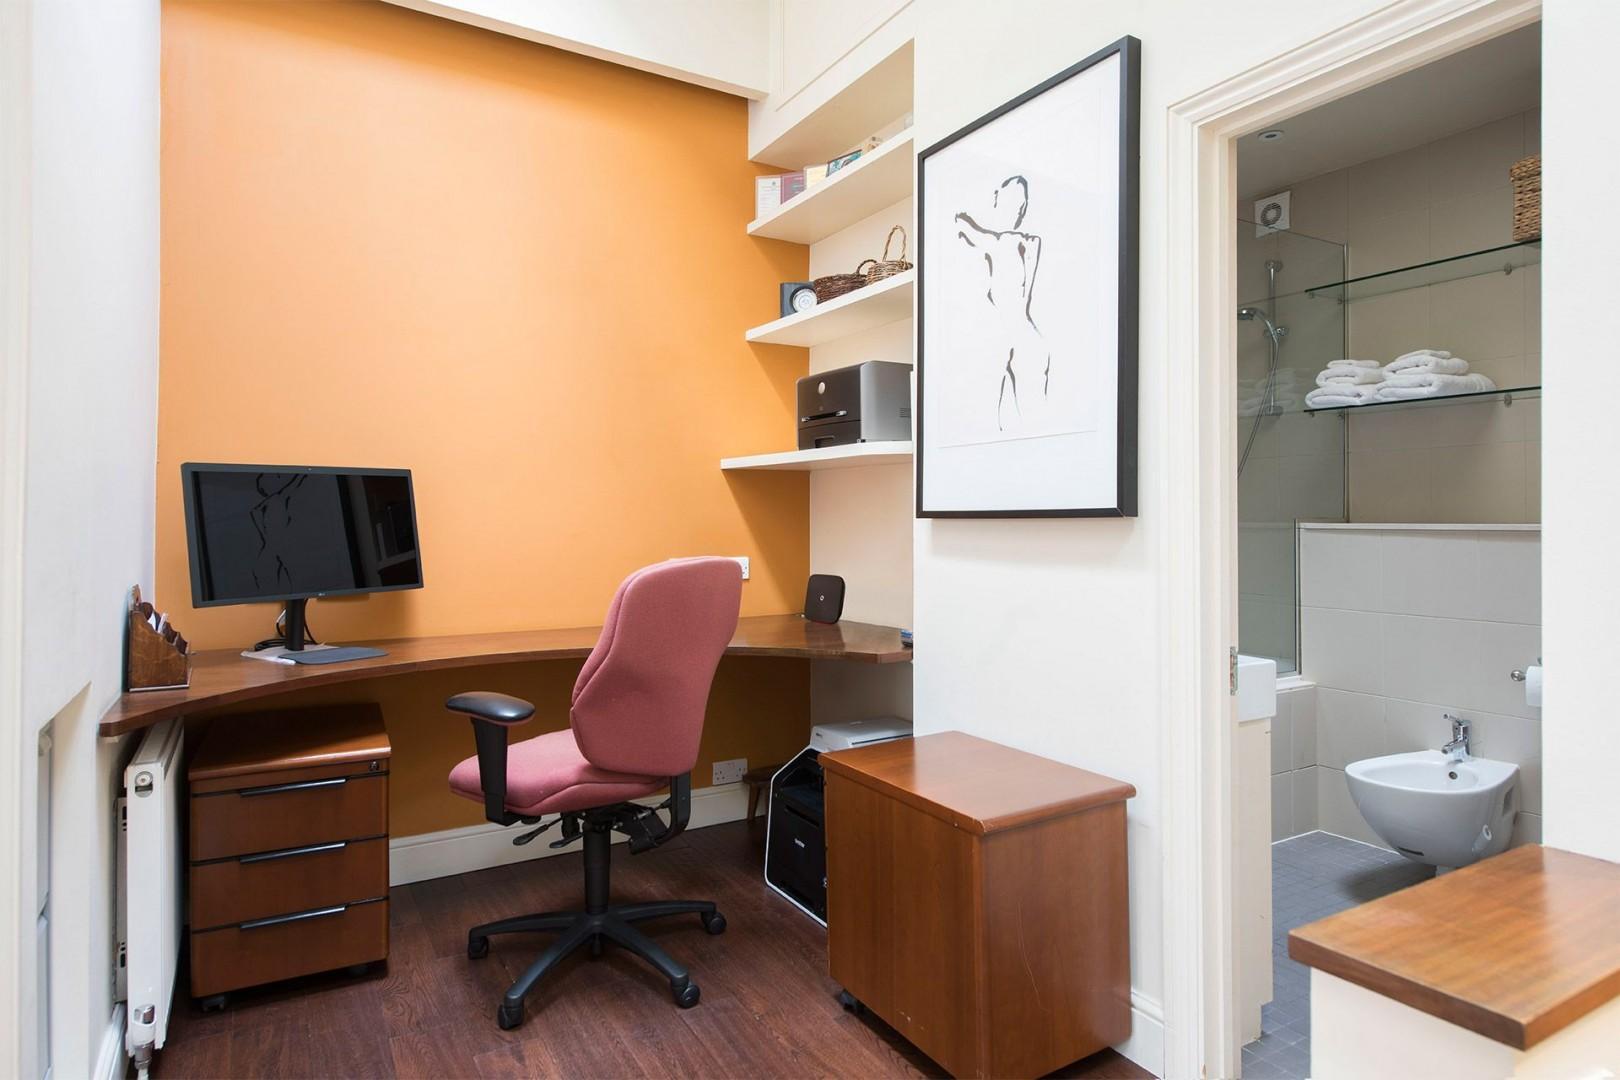 Practical office space in the Prince Albert rental